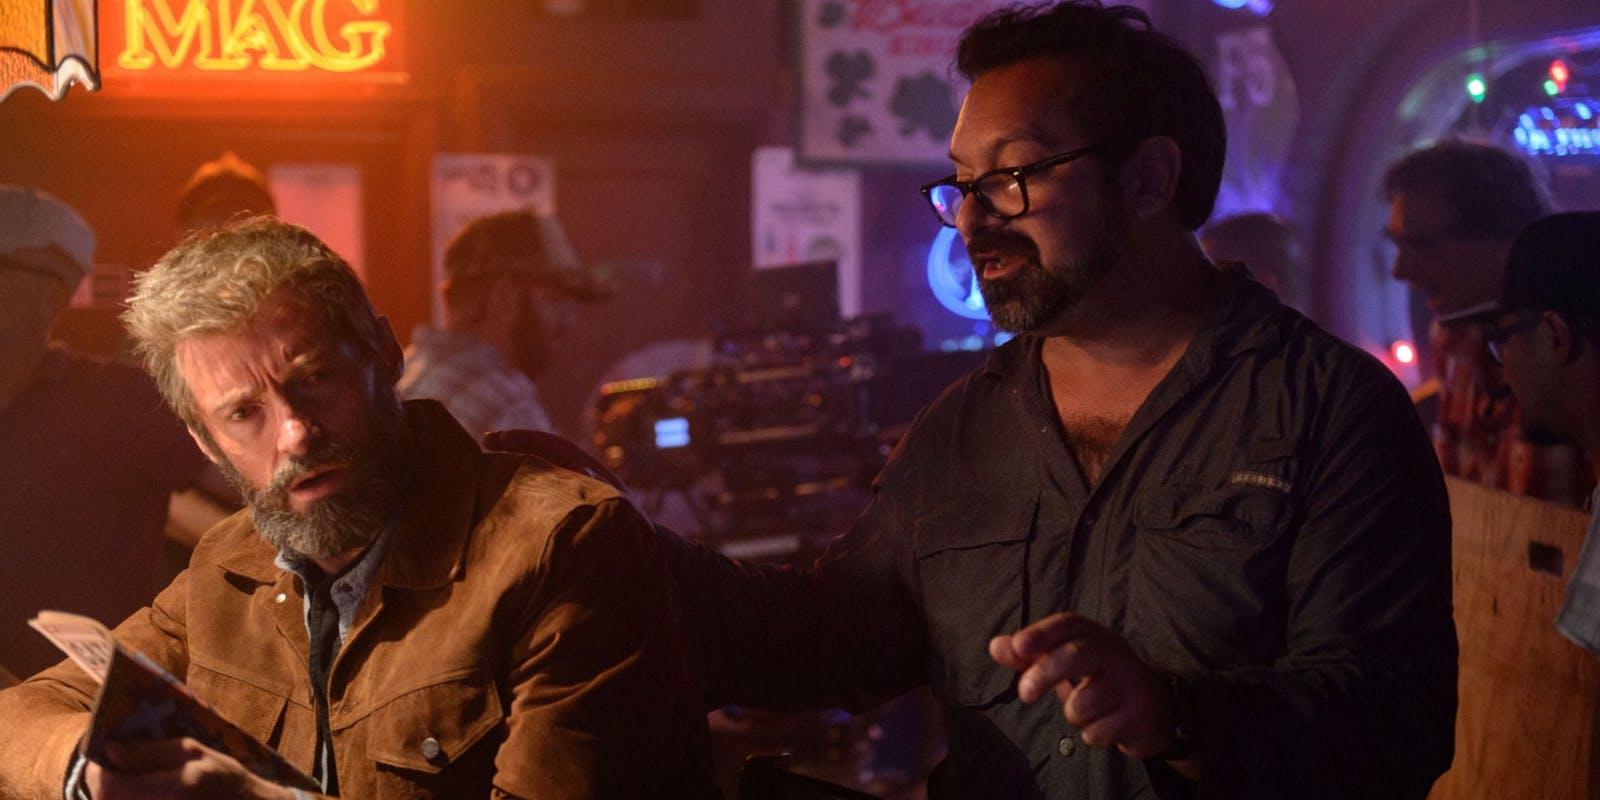 James Mangold dirigindo Hugh Jackman em Logan